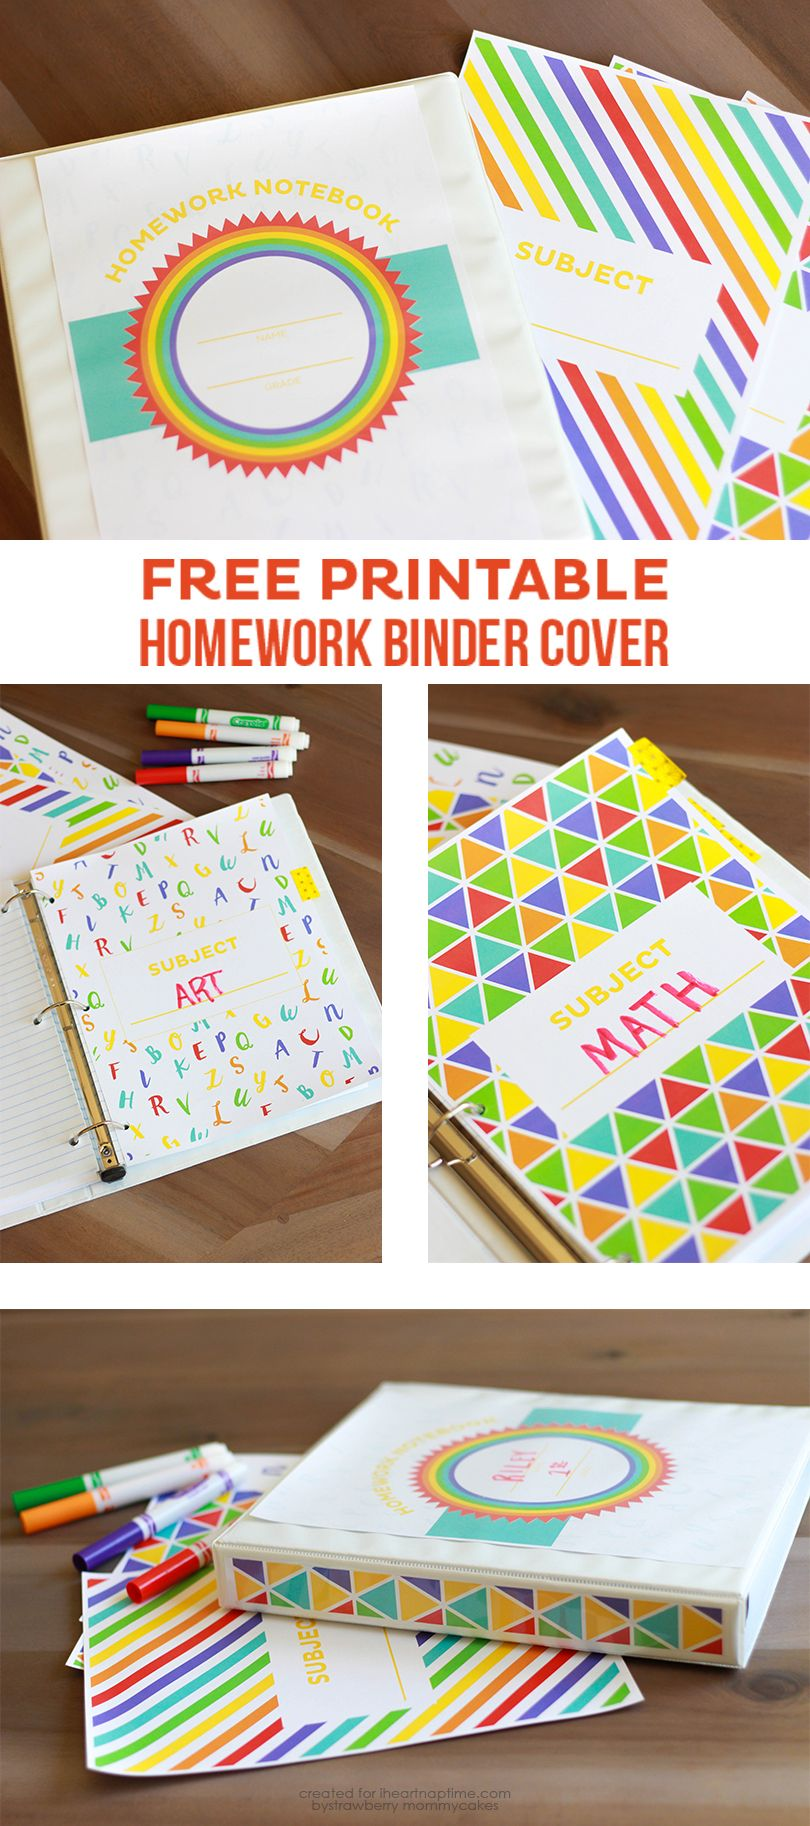 Free Printable Homework Binder Cover The Inspiration Board Homework Binder Binder Covers Binder Covers Free